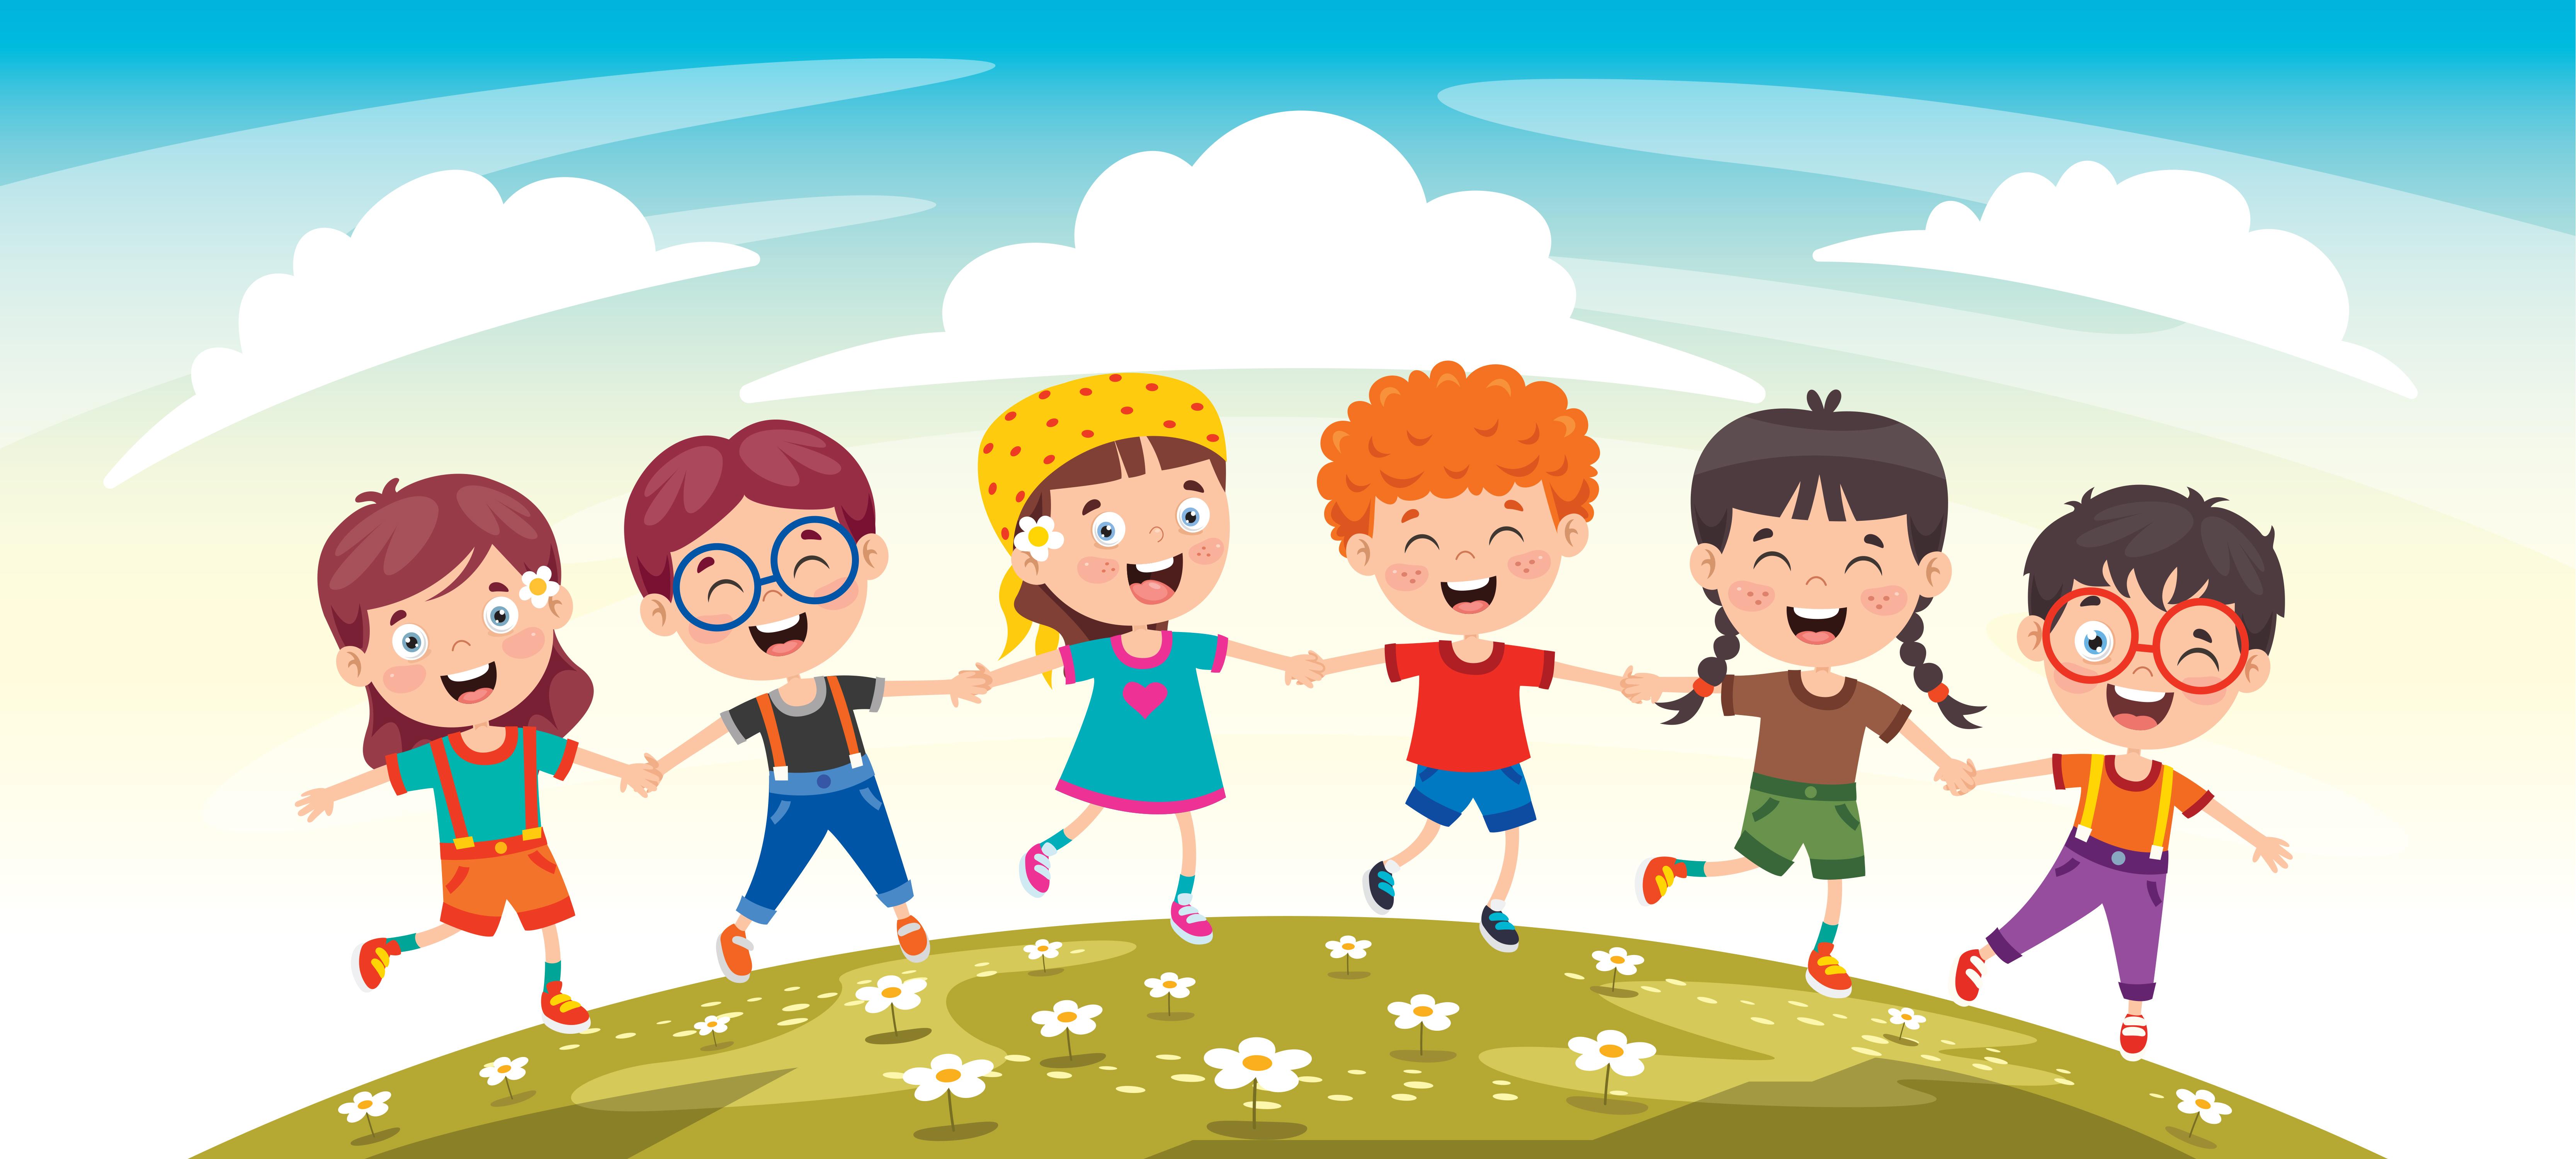 Happy Kid Friends Having Fun Download Free Vectors Clipart Graphics Vector Art